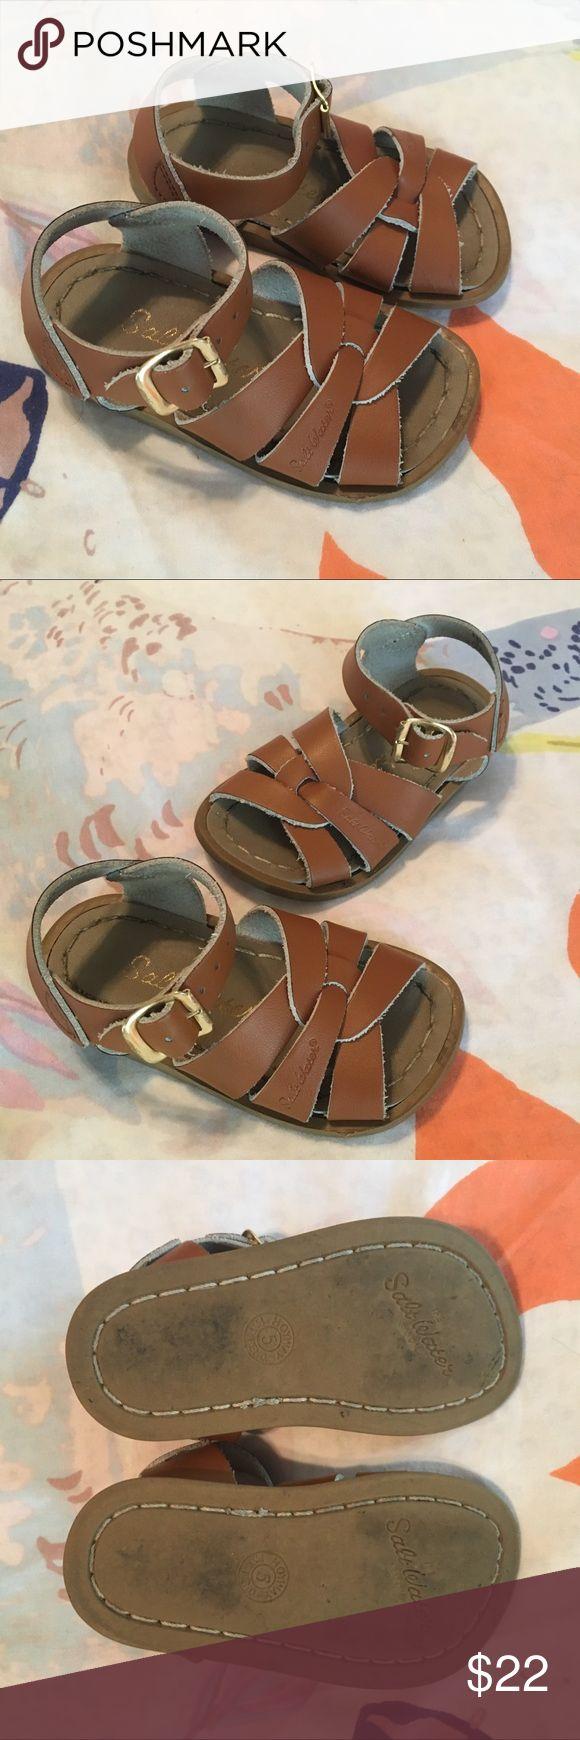 Salt water sandals Tan salt water sandals go with everything! Good condition. Salt Water Sandals by Hoy Shoes Sandals & Flip Flops